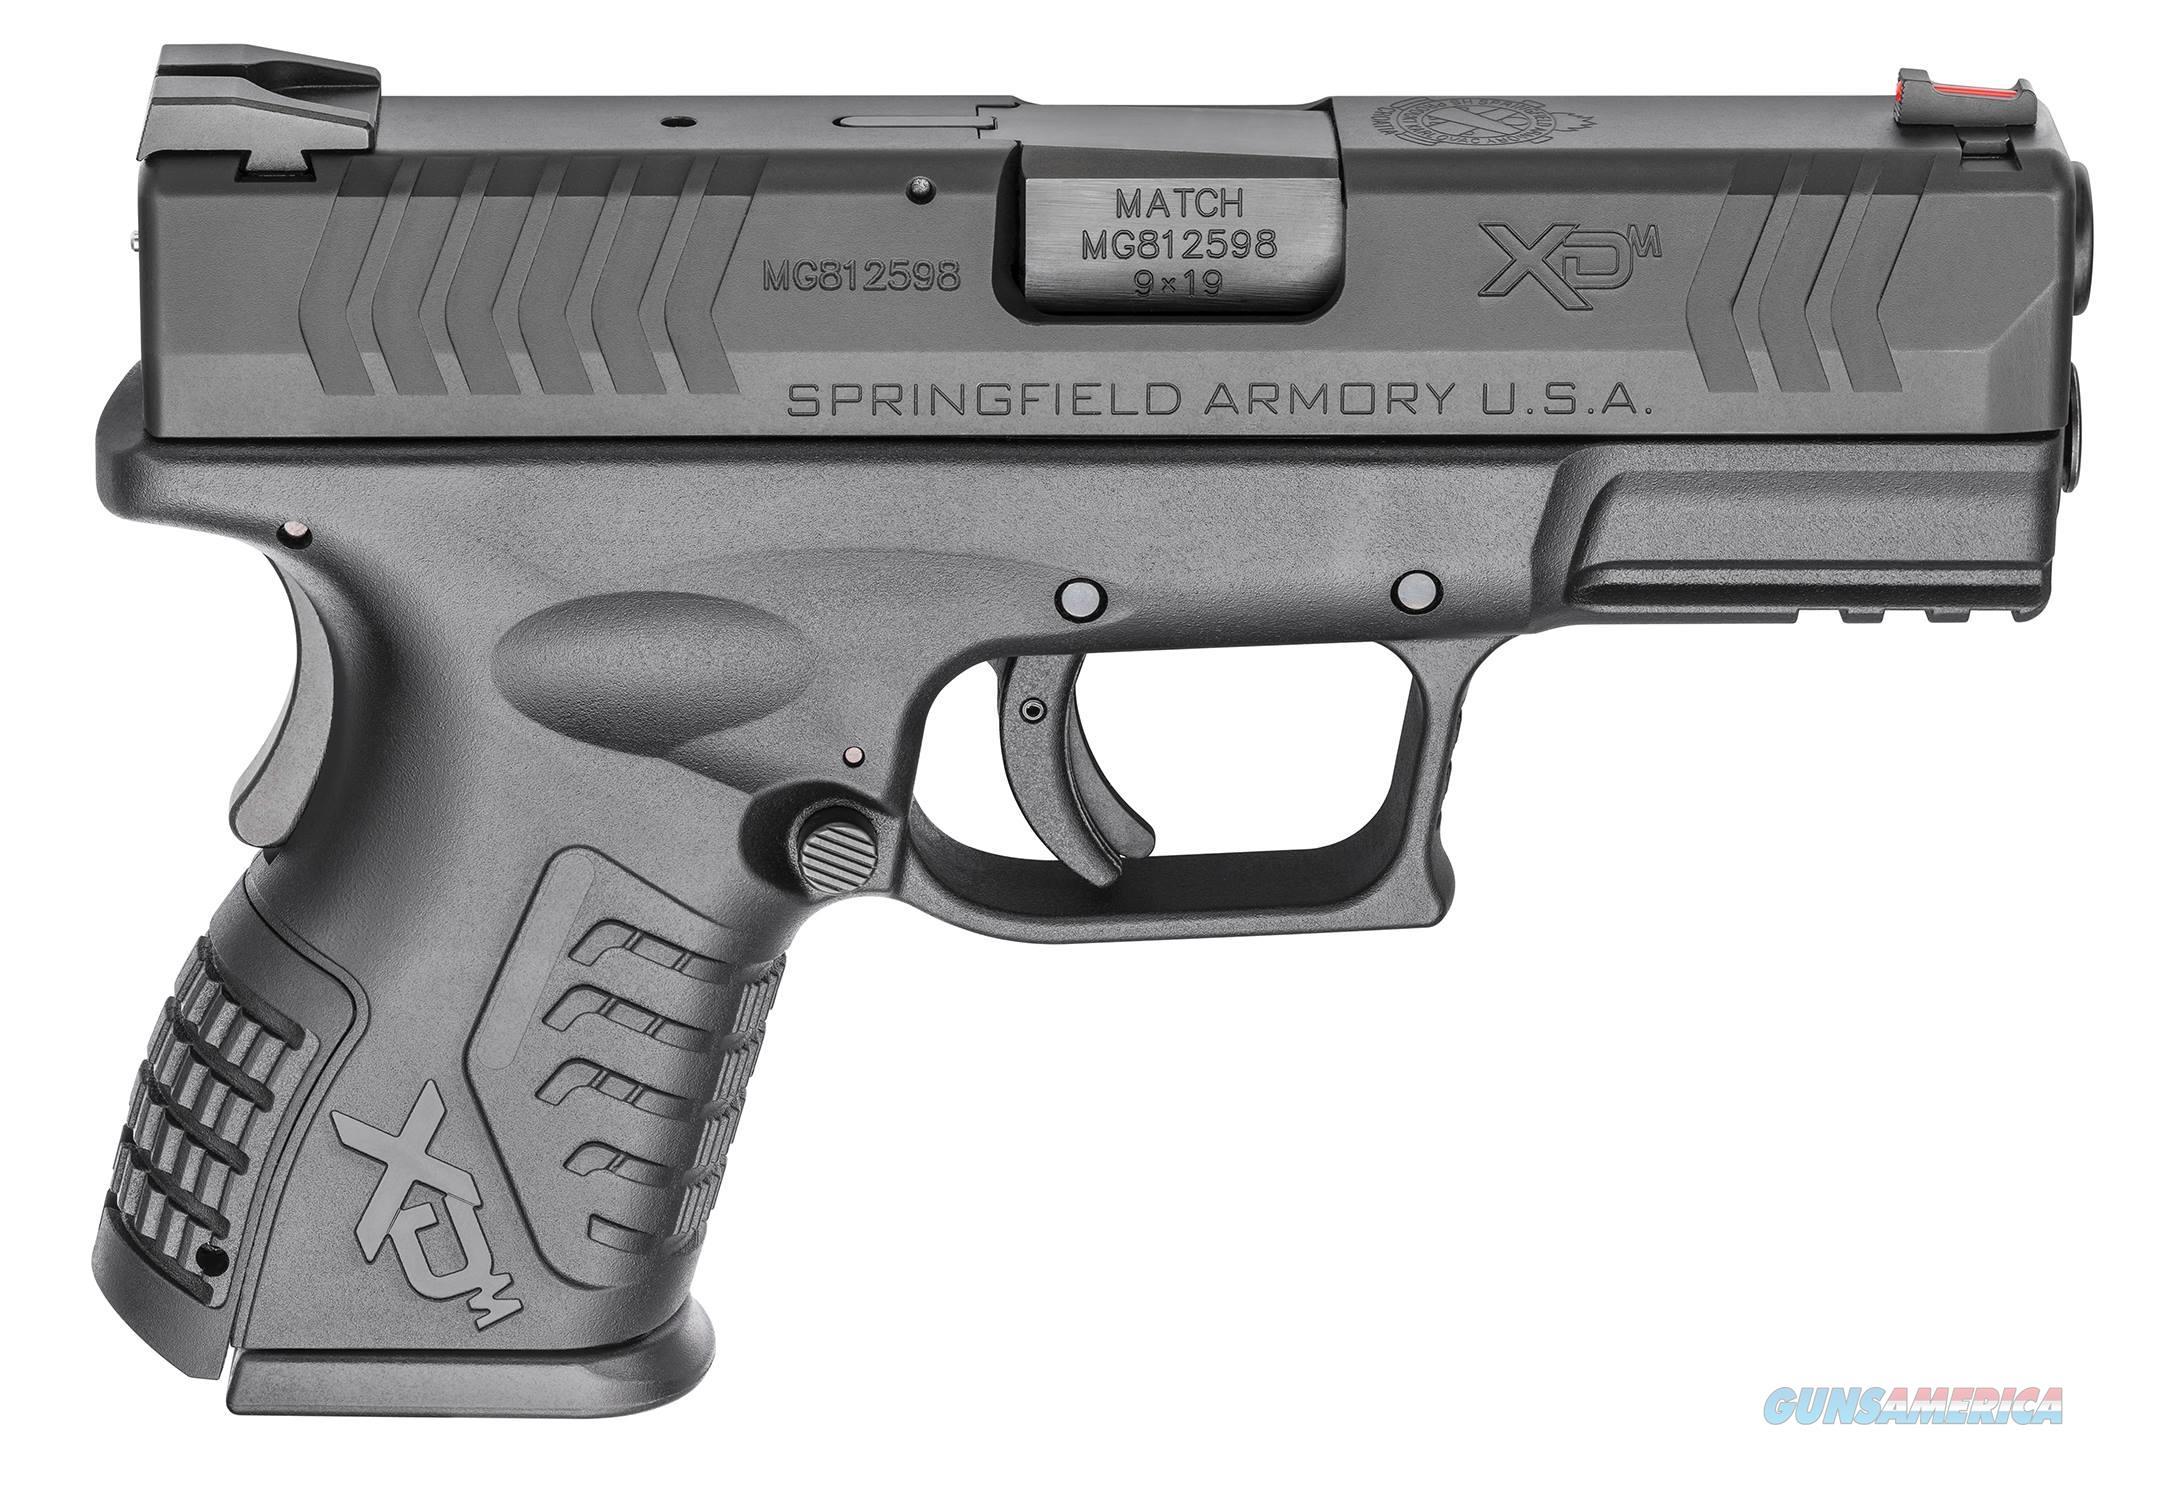 Springfield Armory XDM COMPACT 9MM BLK 3.8 19+1   Guns > Pistols > Springfield Armory Pistols > XD-M